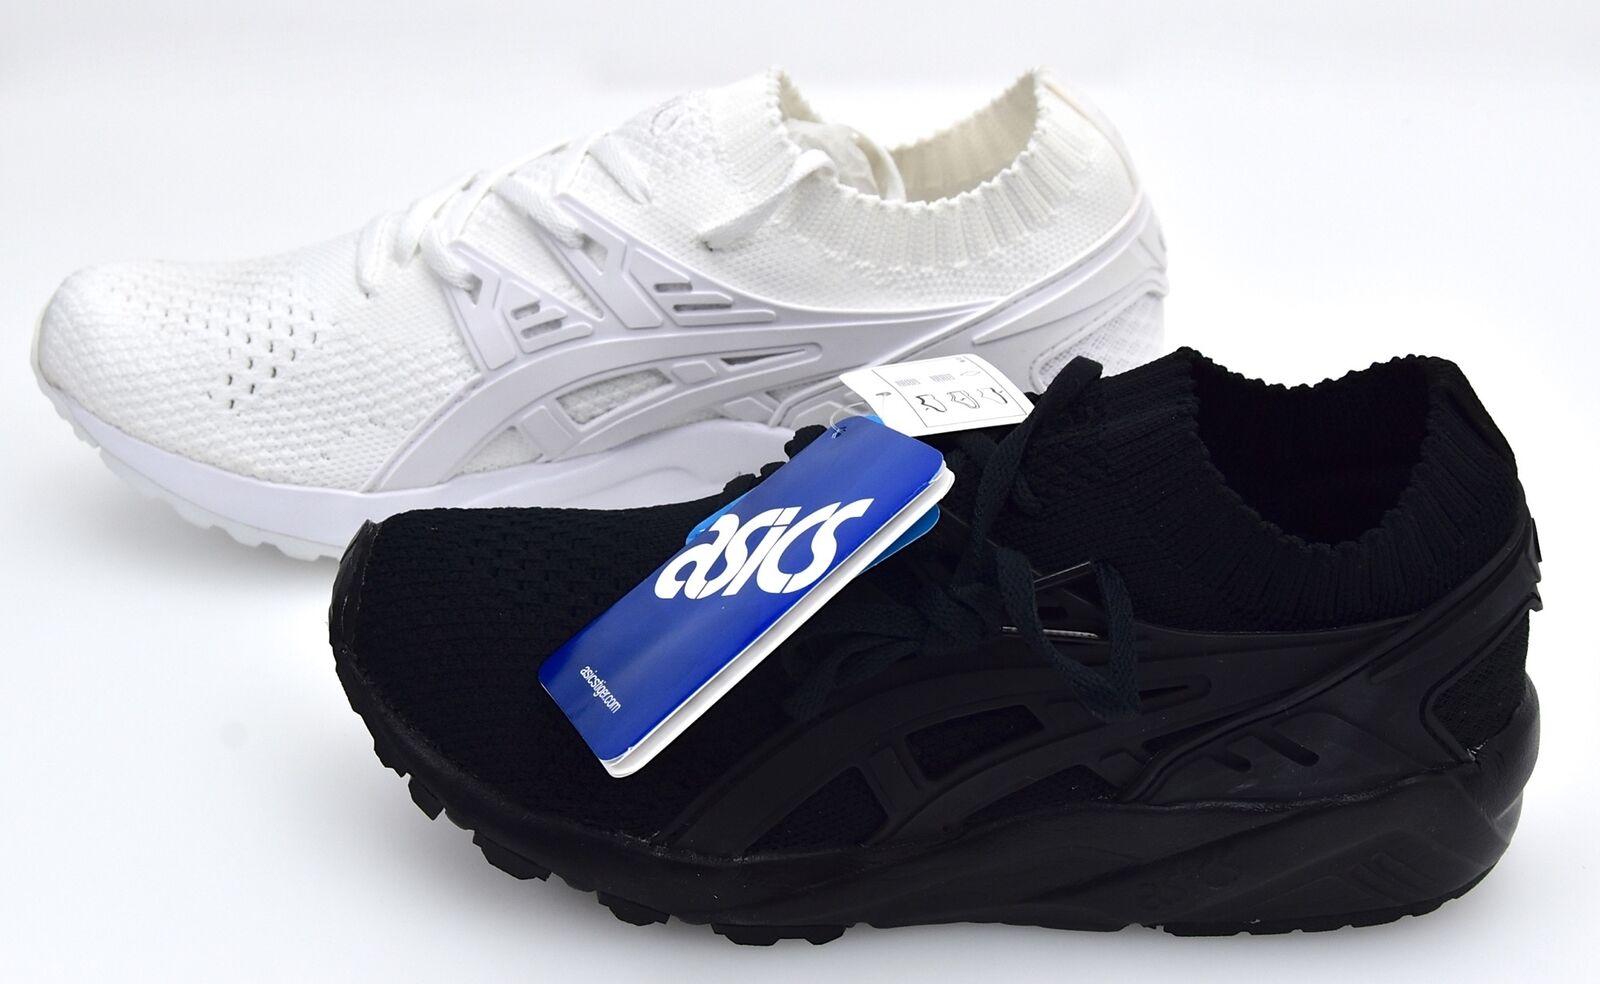 Asics Hombre Deportes Tenis Zapatos H705N 9090-H705N 0101 Gel-Kayano entrenador de punto